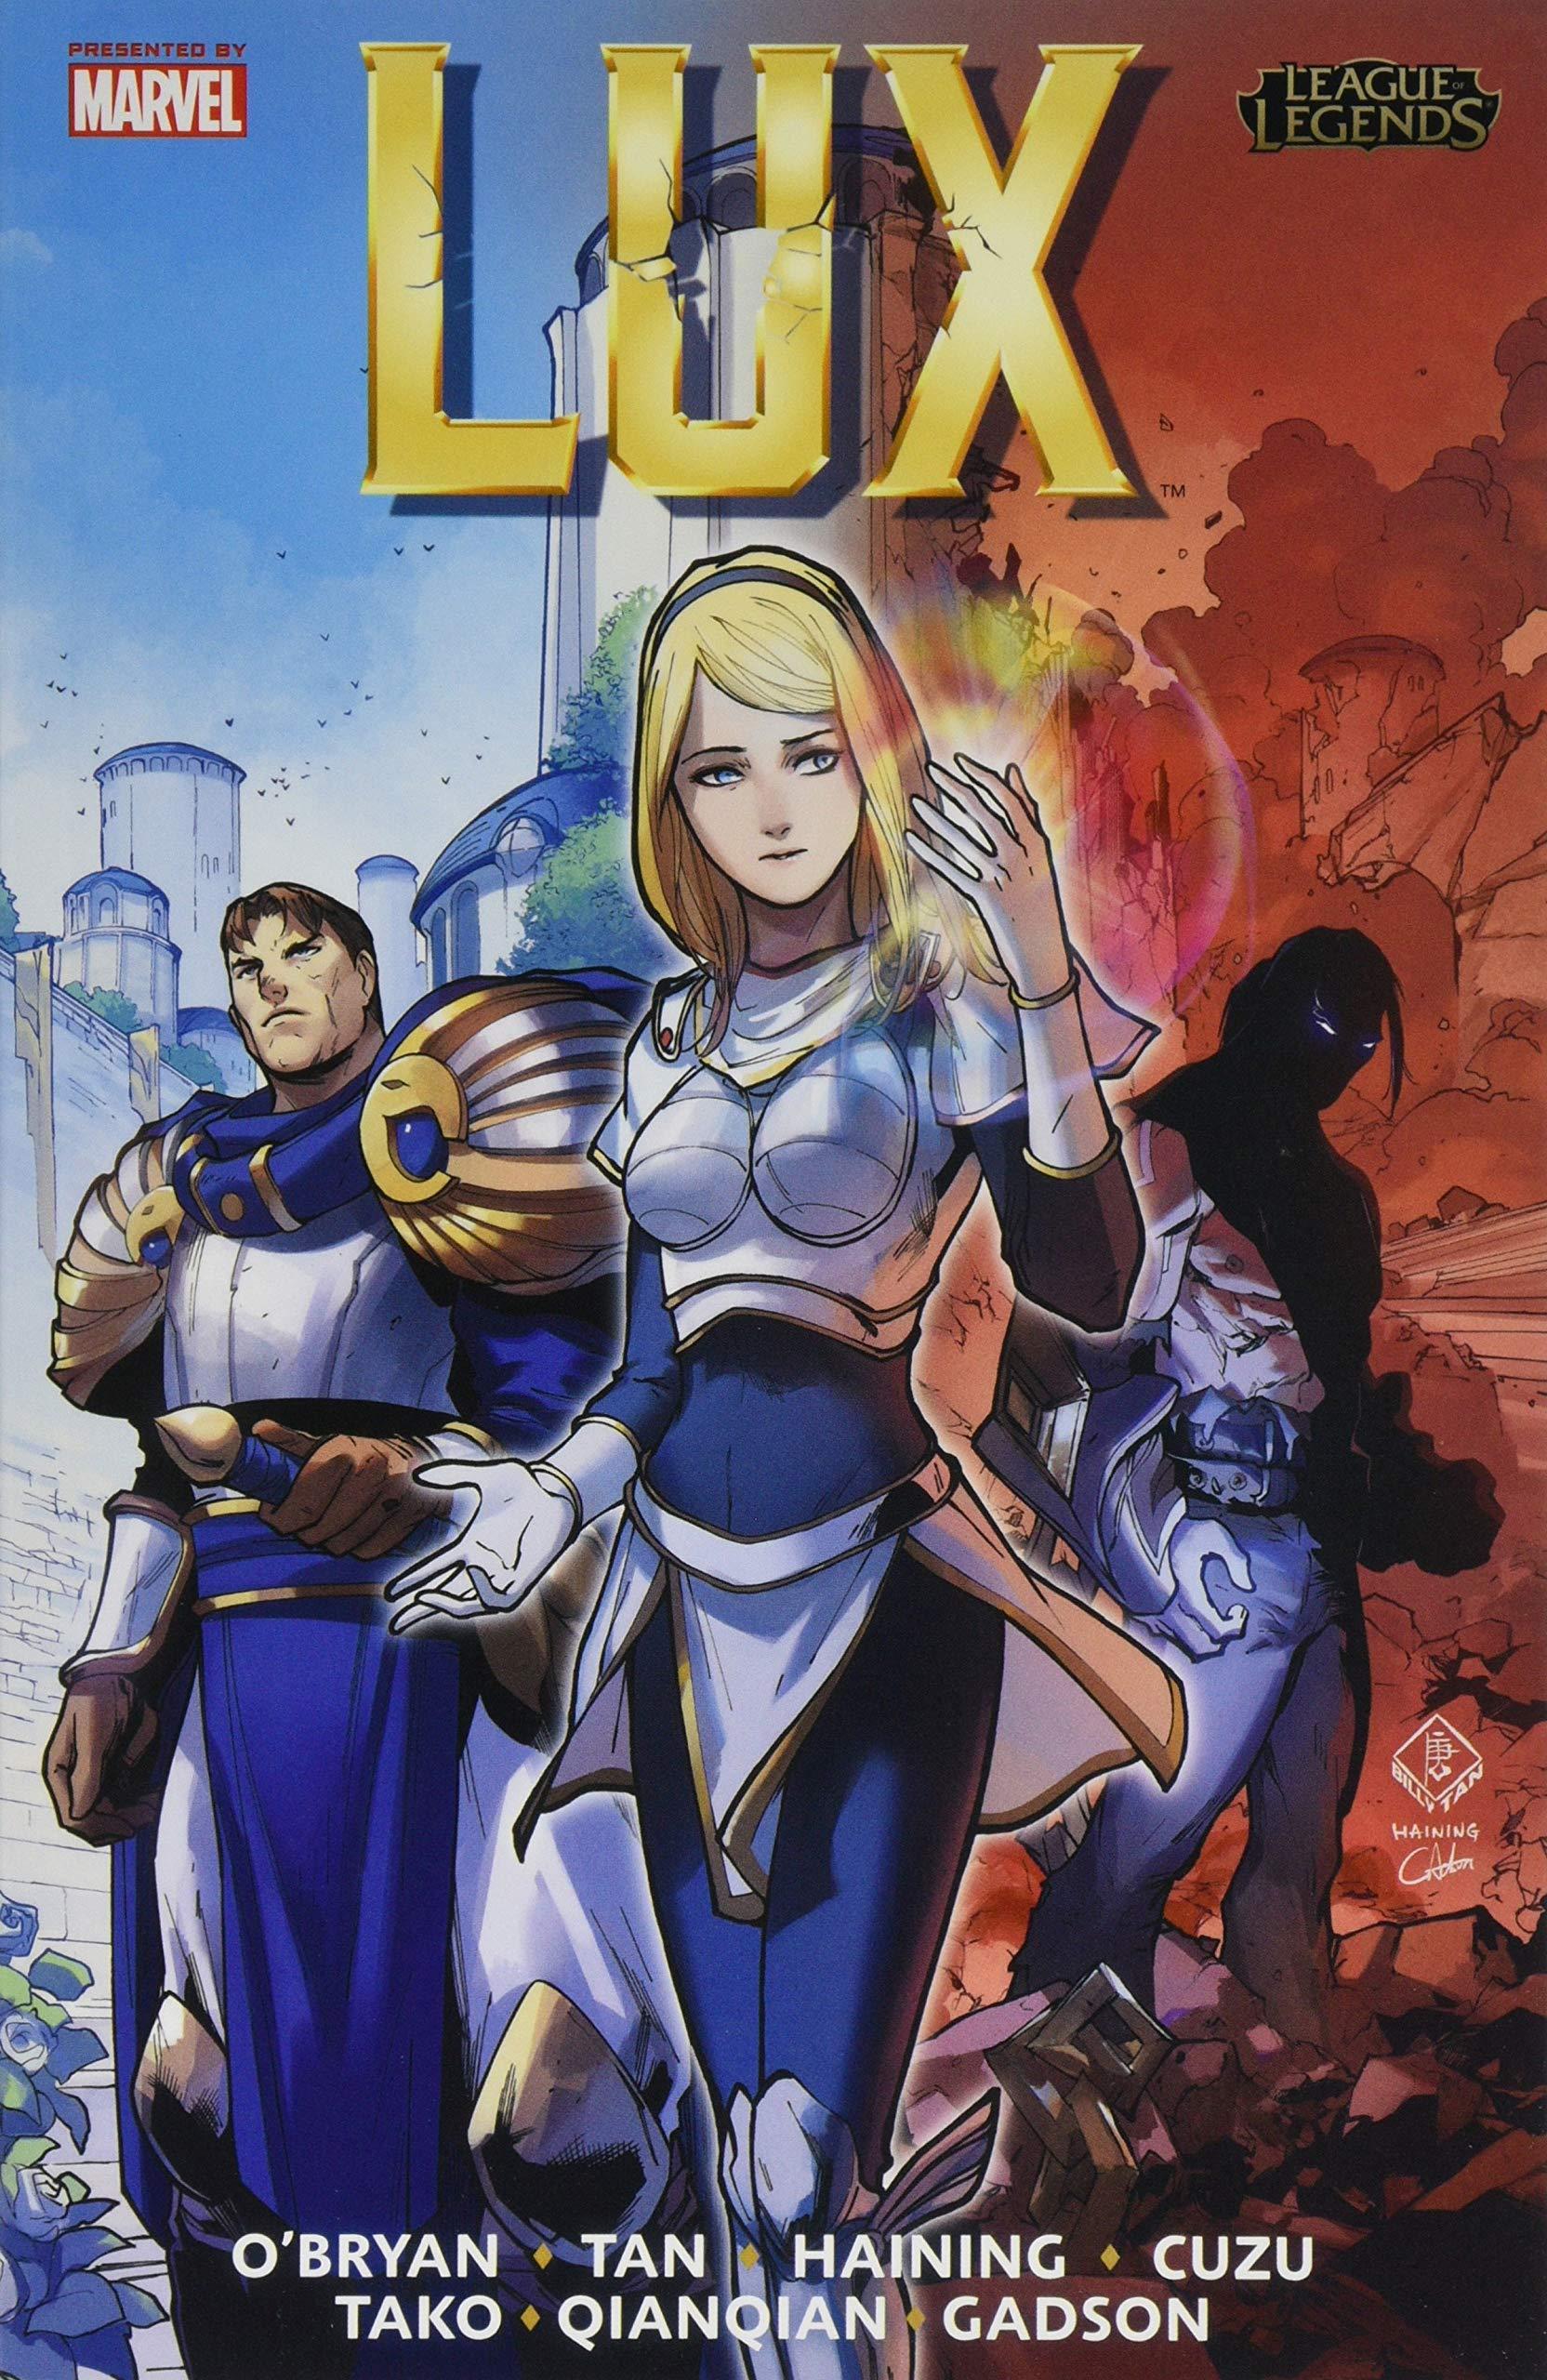 Obryan, J: League Of Legends: Lux: Amazon.es: OBryan, John, Tan, Billy: Libros en idiomas extranjeros